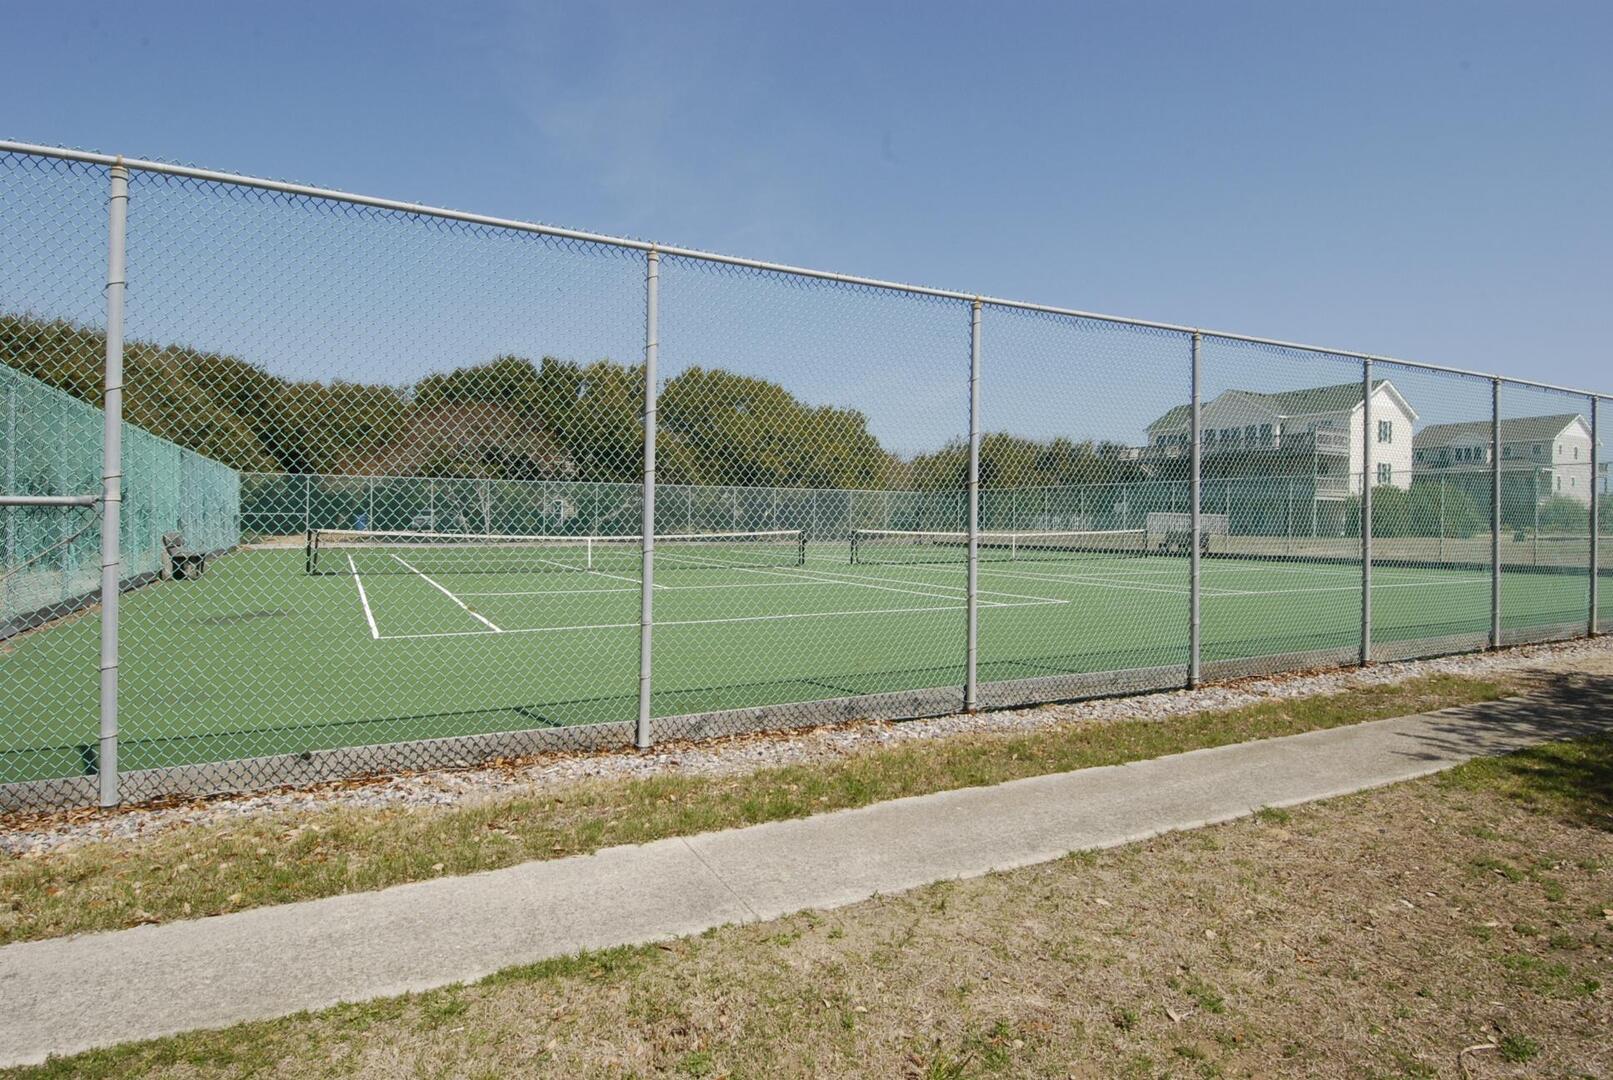 Amenity,Port Trinitie Community Tennis Courts,